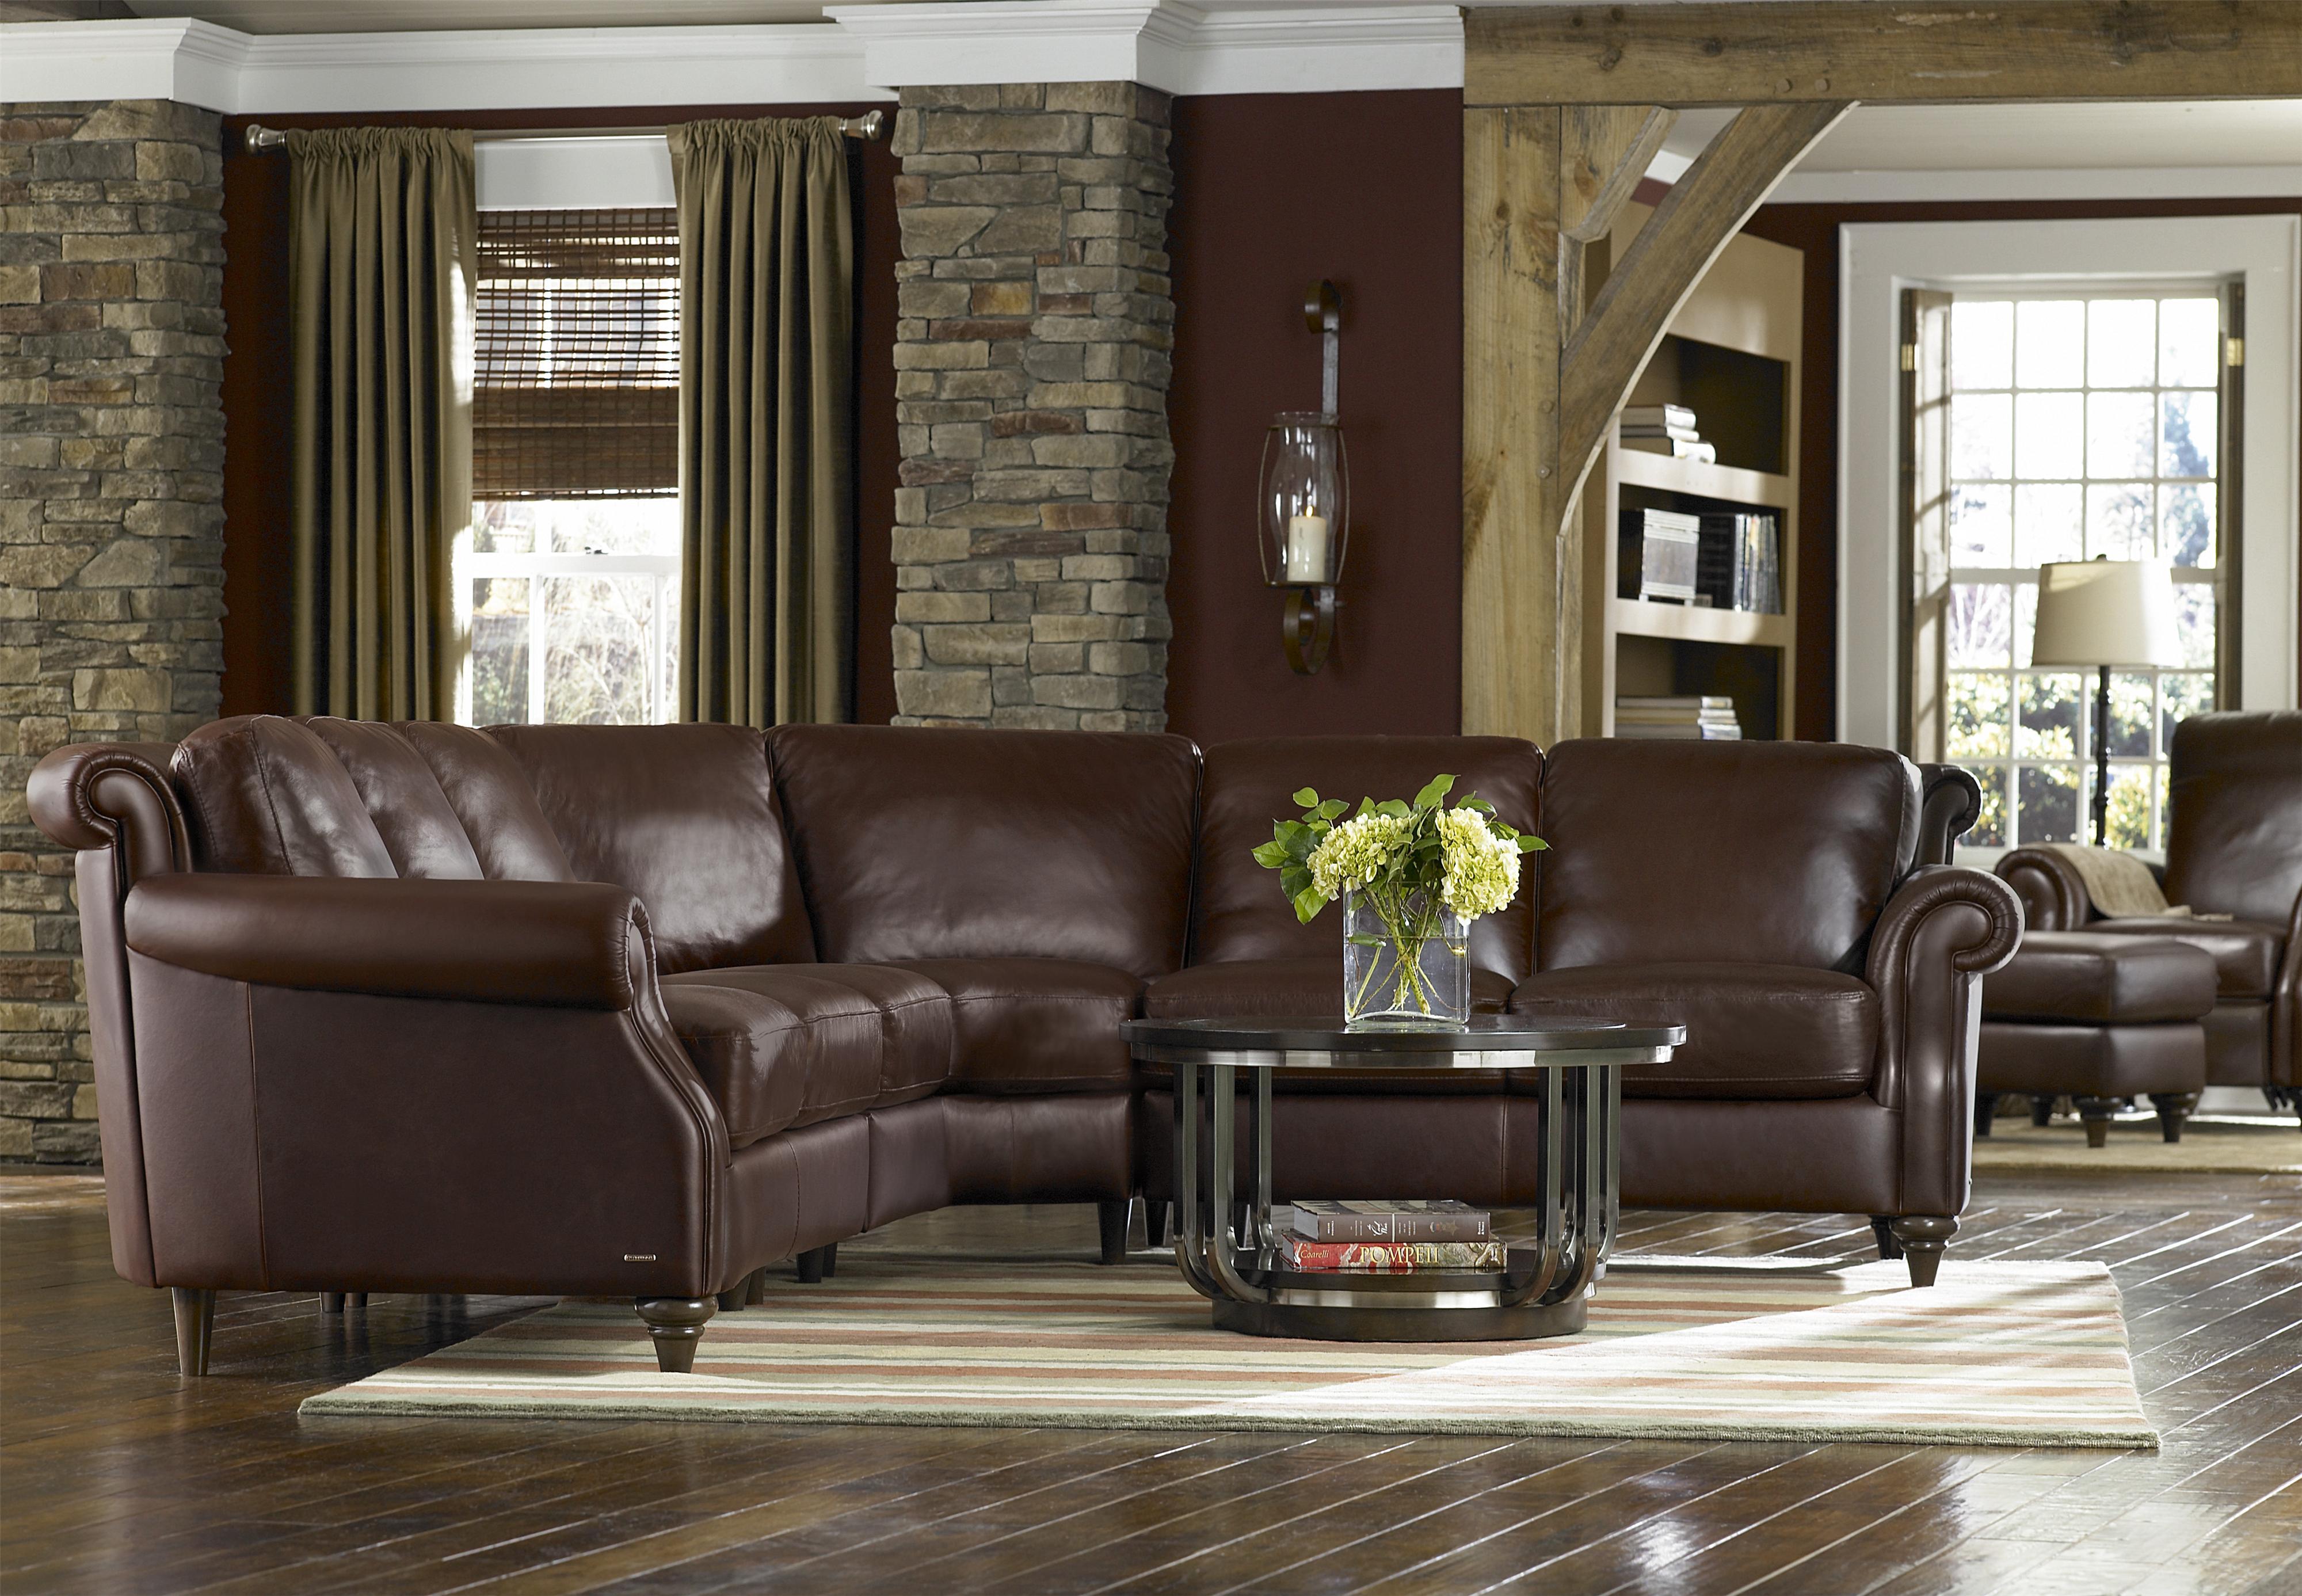 Natuzzi editions a297 rolled arm sofa w exposed wood legs wilsons furniture sofa bellingham ferndale lynden and birch bayblaine washington